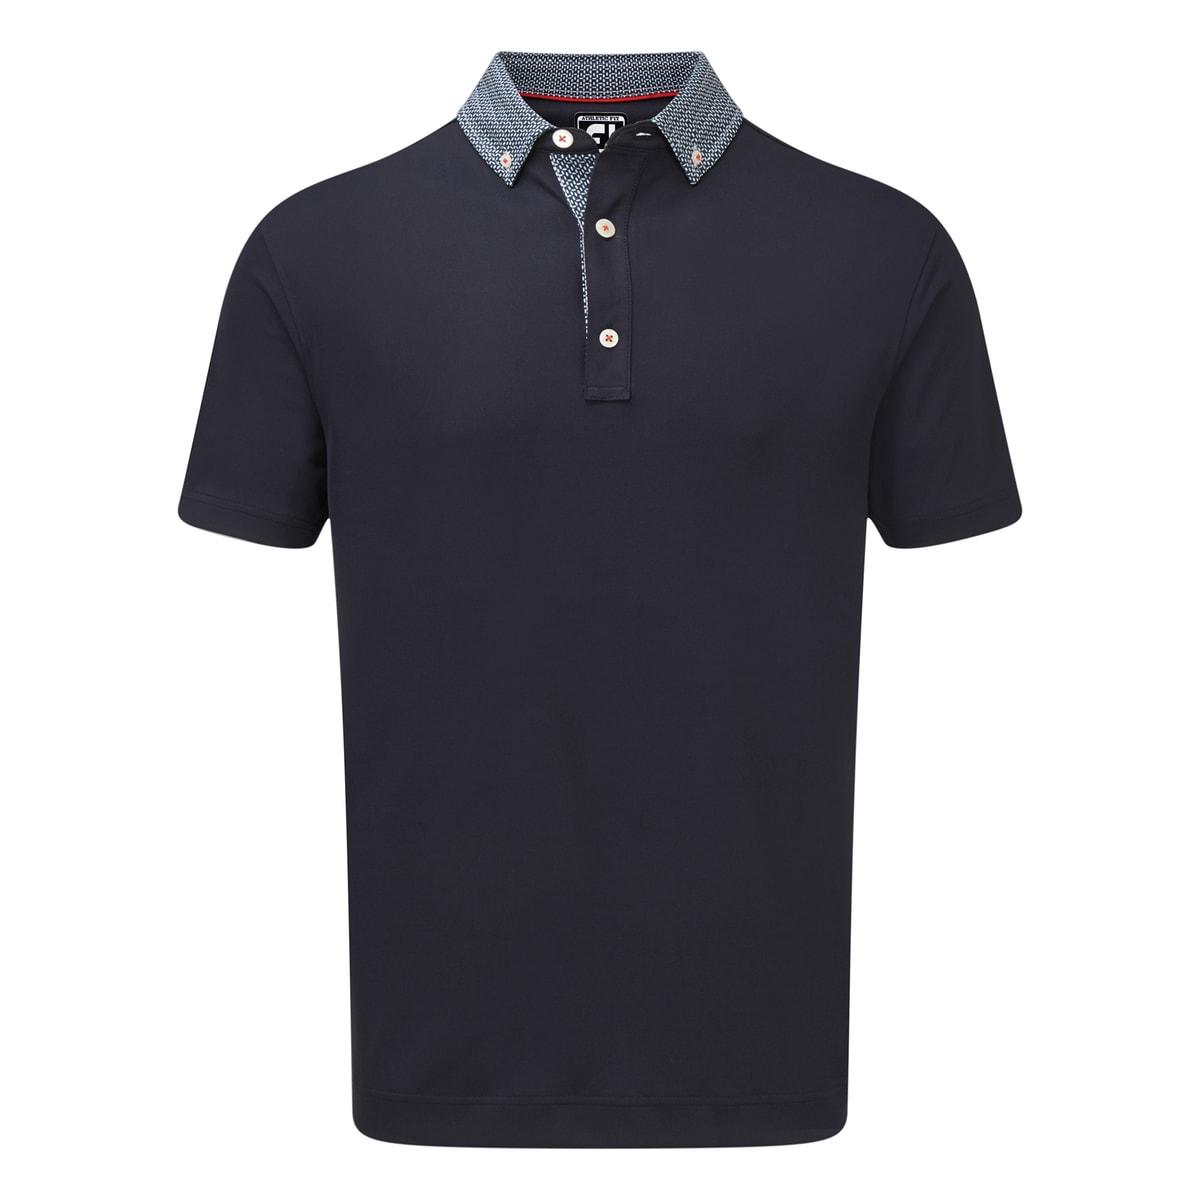 Stretch Pique with Woven Buttondown Collar